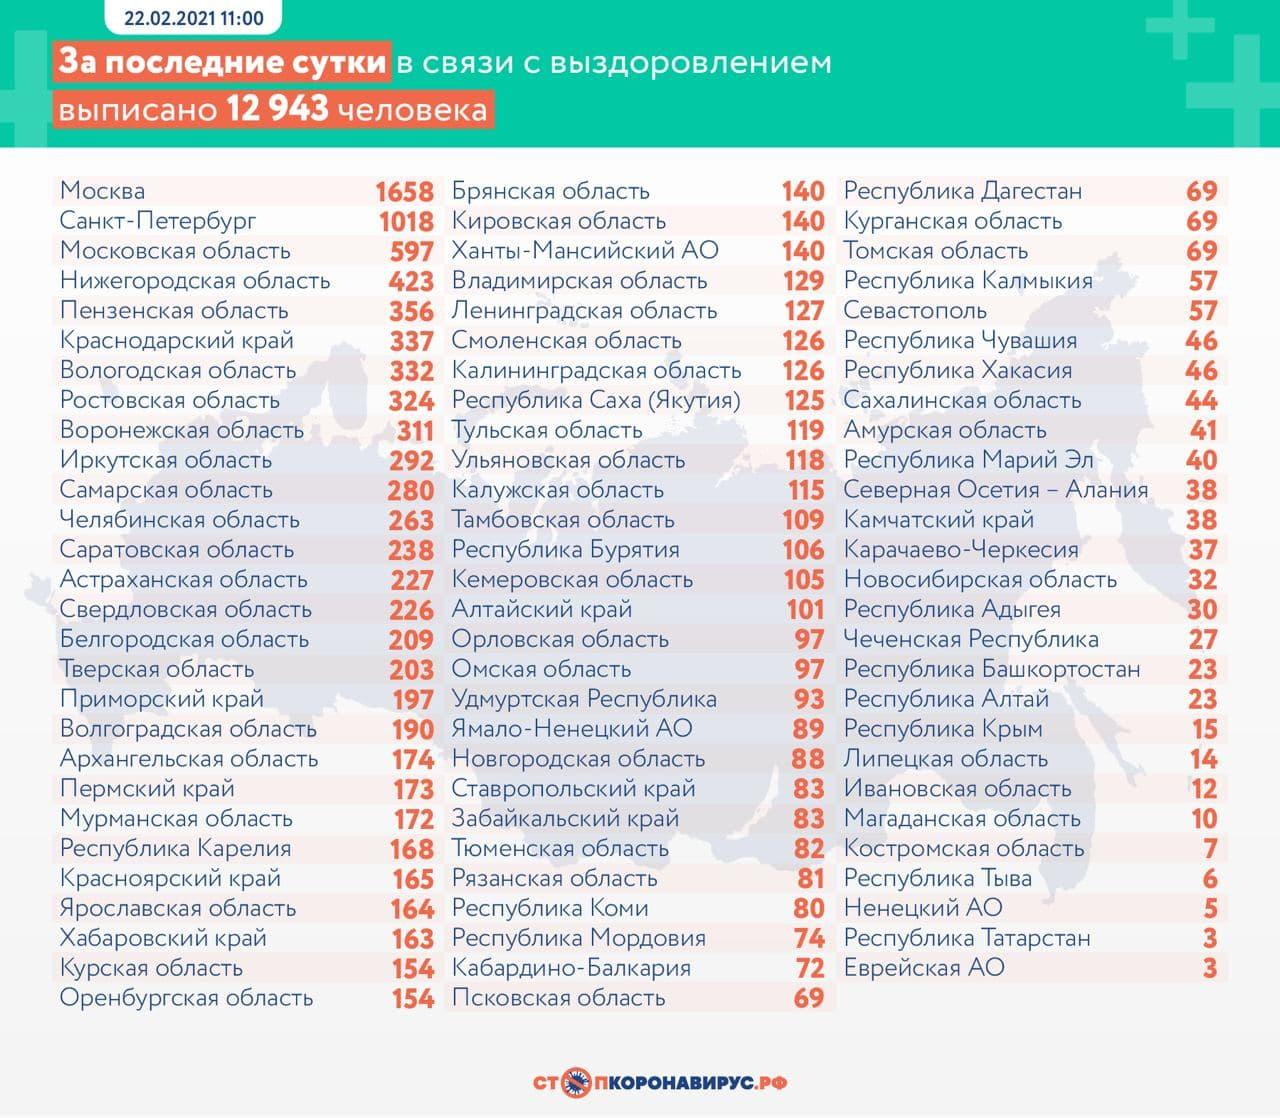 Оперативная статистика по коронавирусу в России на 22 февраля